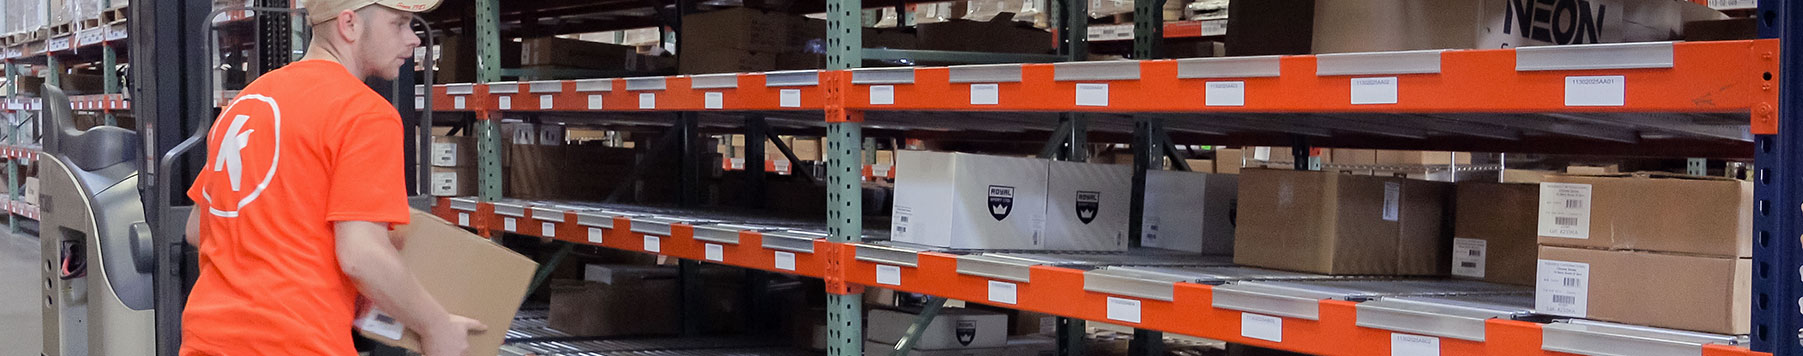 contract logistics services